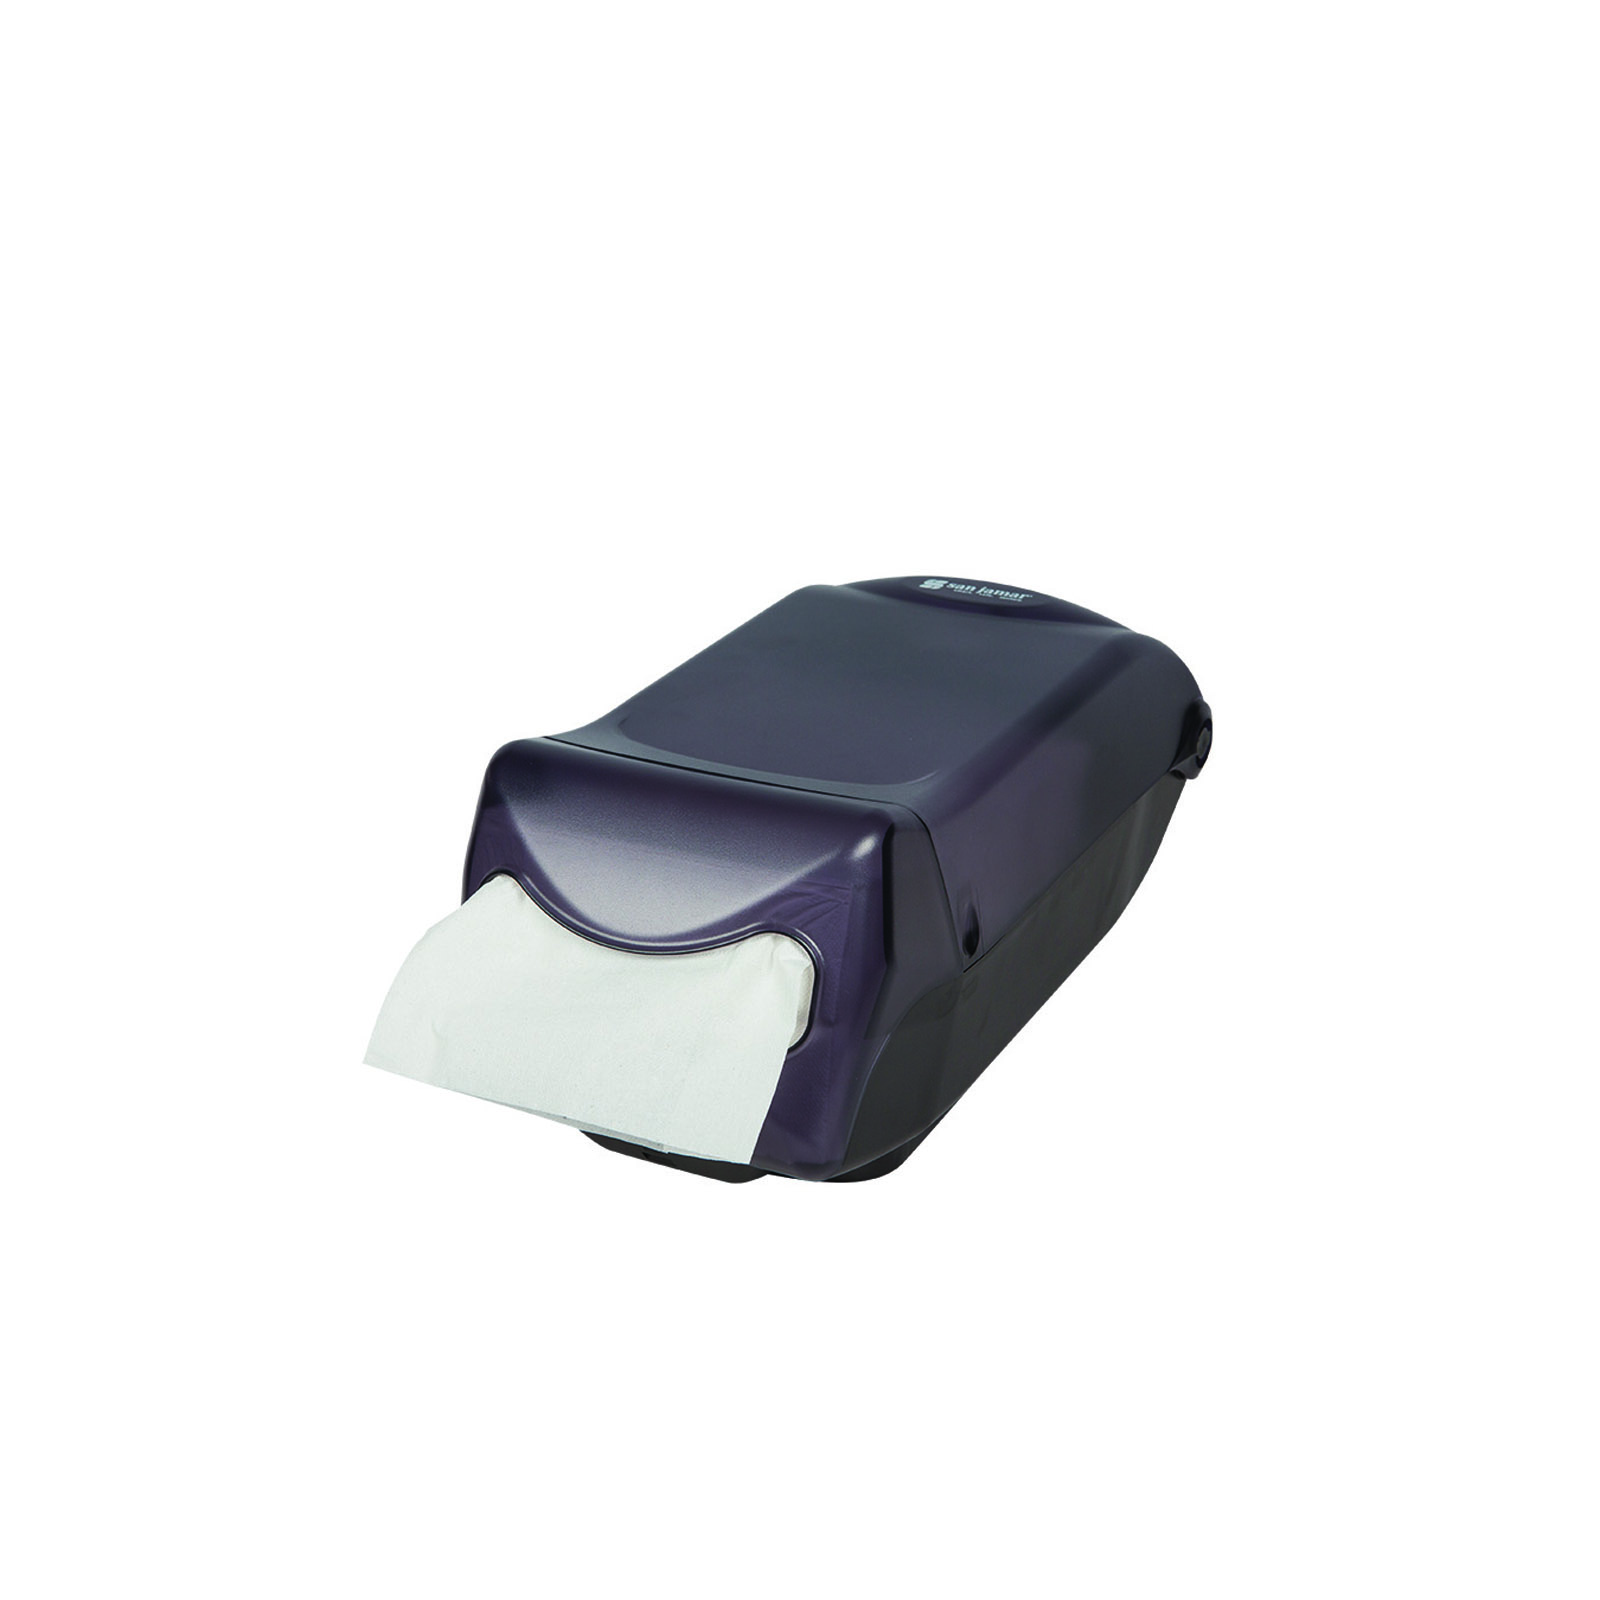 San Jamar H5003TBK paper napkin dispenser